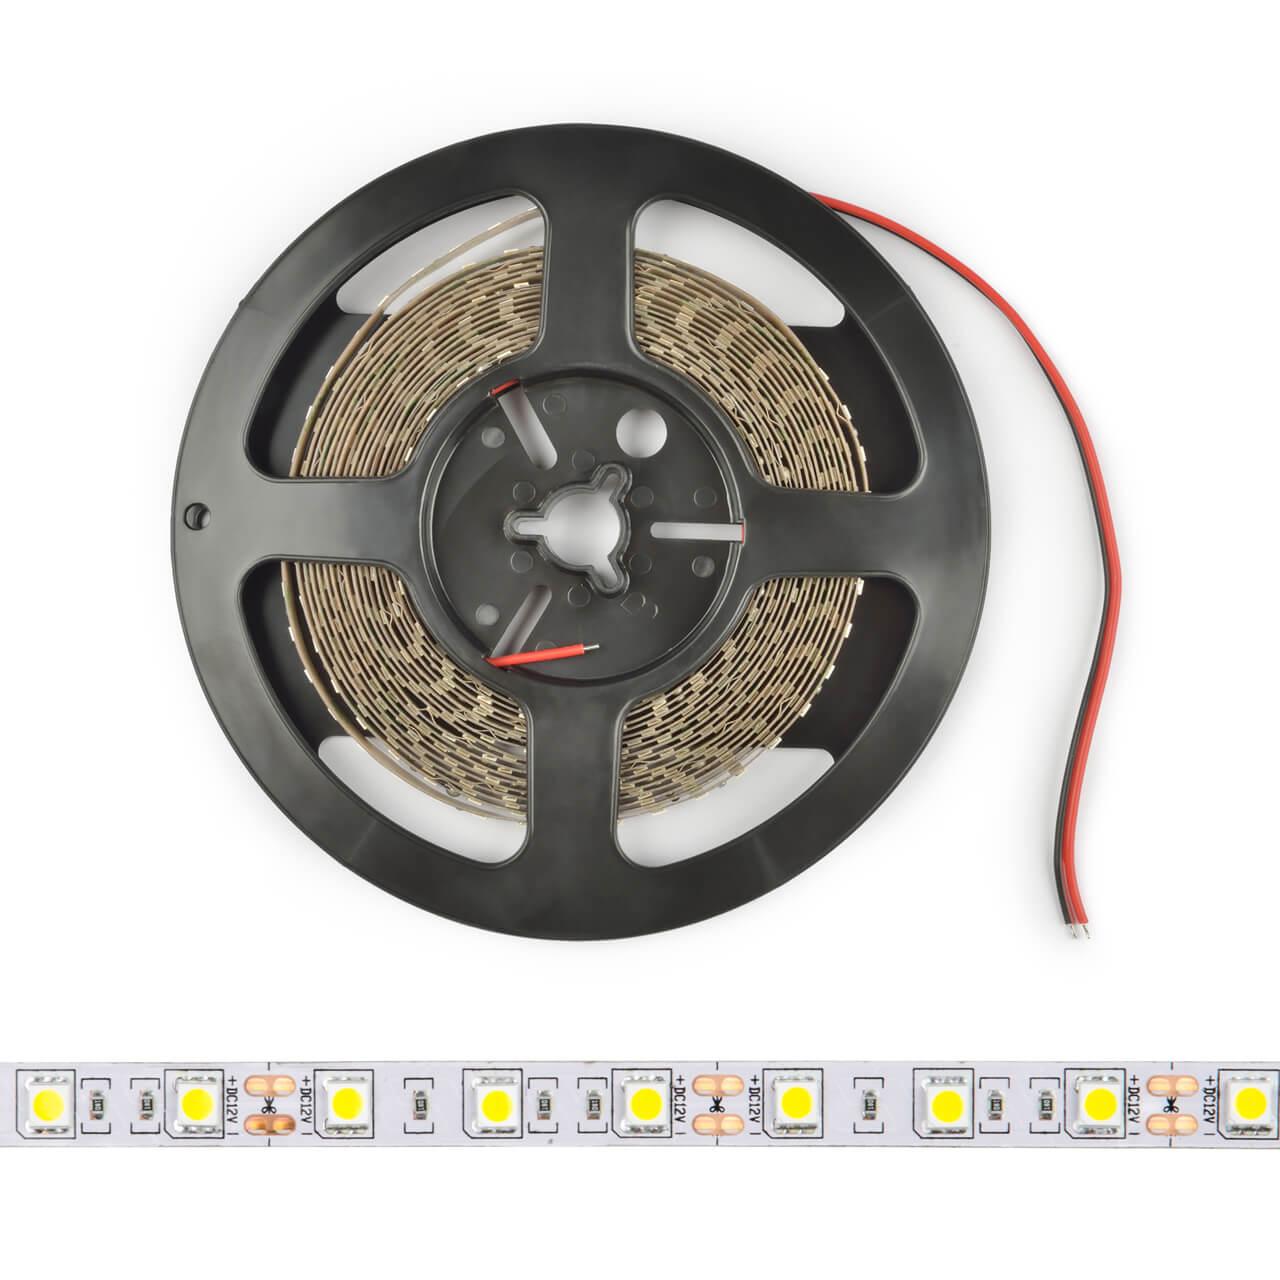 Светодиодная лента Uniel (UL-00004375) 14,4W/m 60LED/m 5050SMD RGB 5M ULS-M25-5050-60LED/m-10mm-IP20-DC12V-14,4W/m-5M-RGB PROFI designled светодиодная лента designled smd 3535 5m 120led m 20w 24v rgb dsg3a120 24 rgb 33